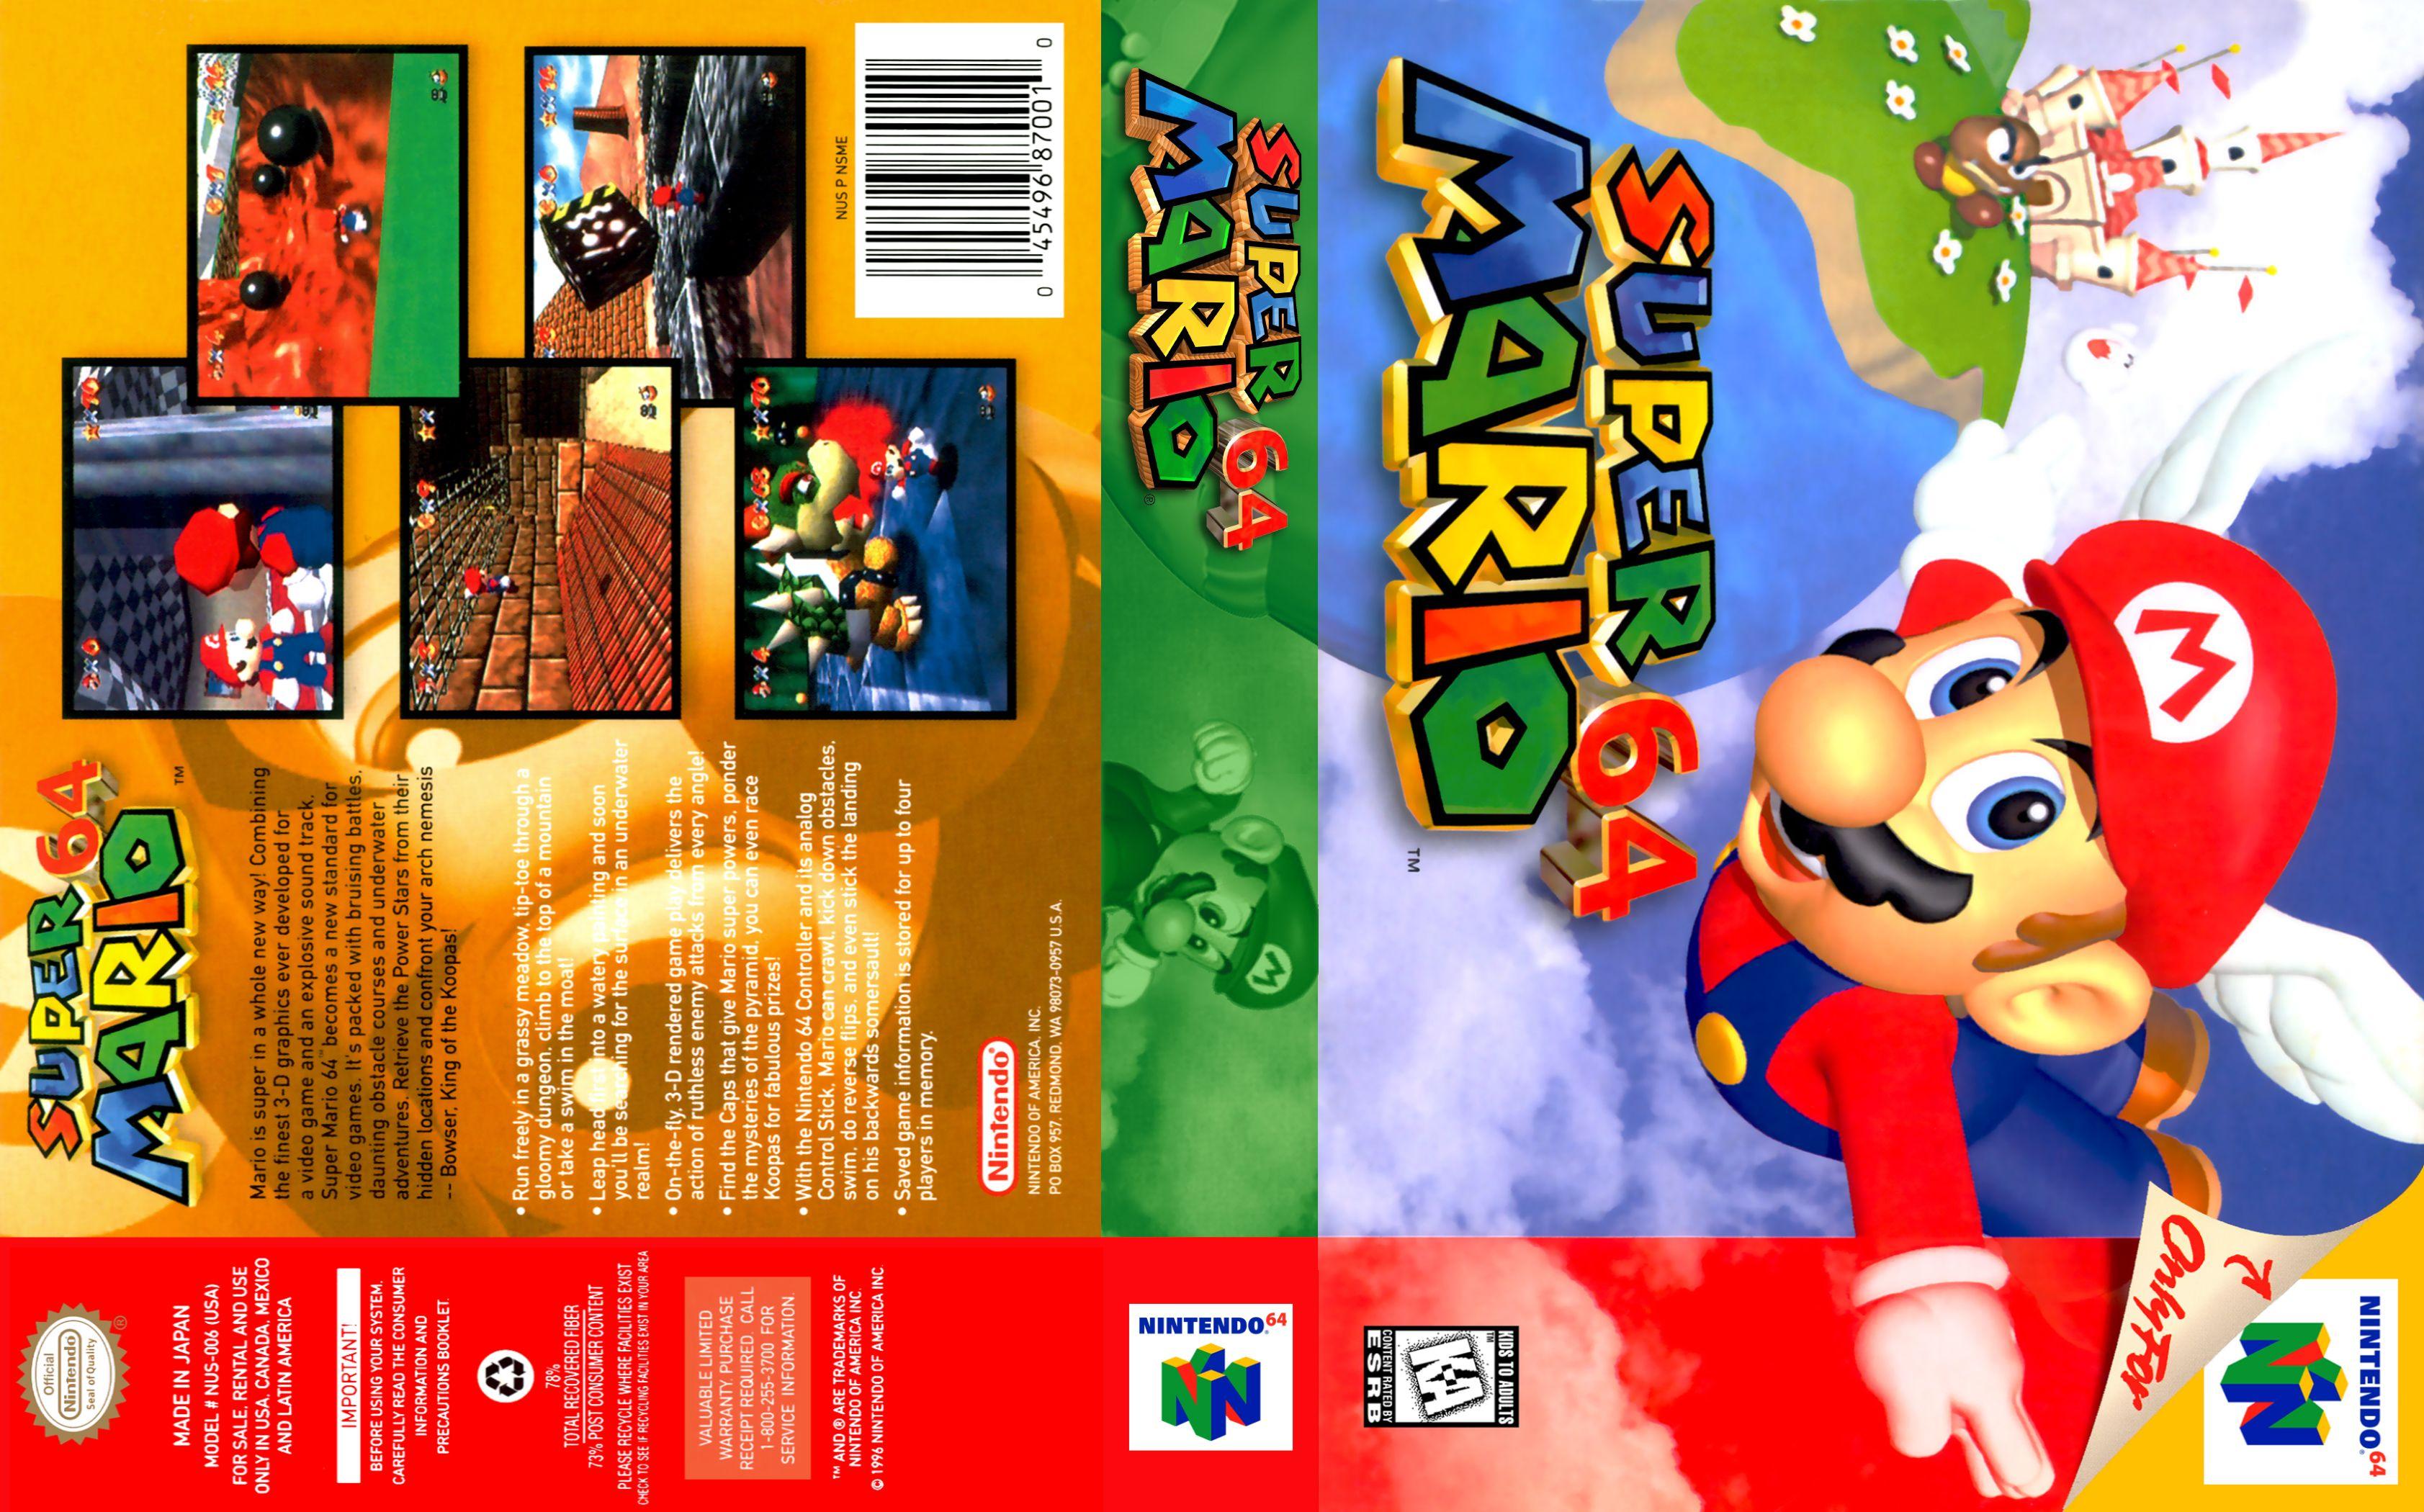 Super Mario 64 Nintendo 64 Covers Cover Century Over 500 000